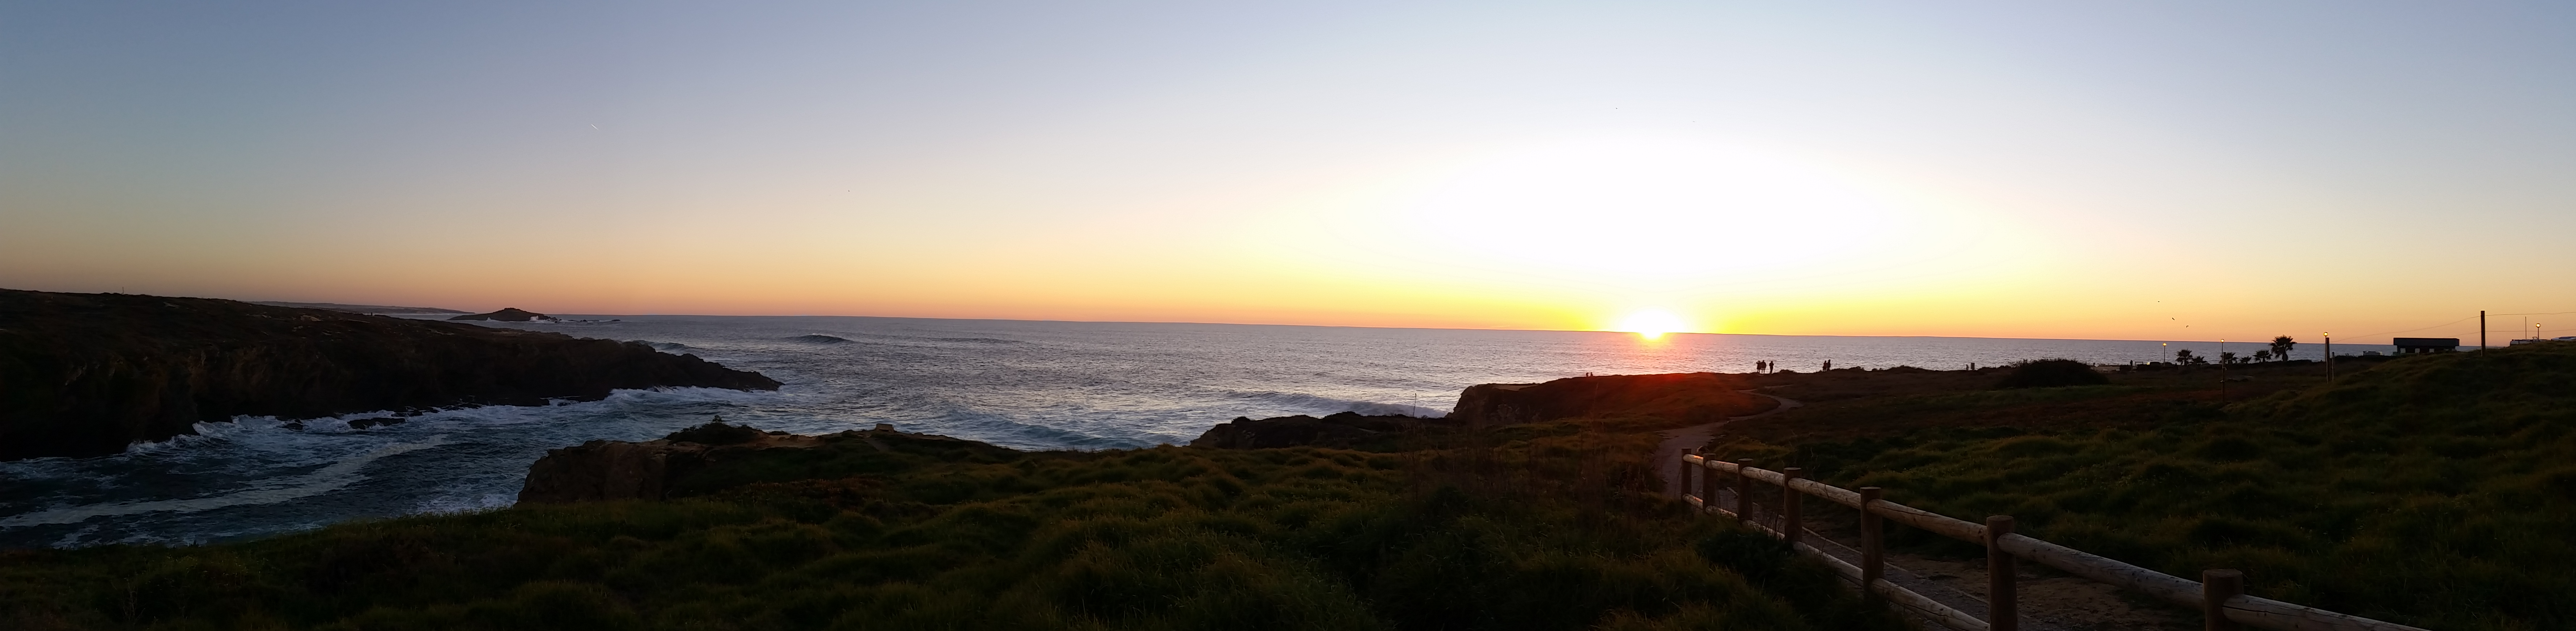 Traumhafter Sonnenuntergang in Porto Covo.